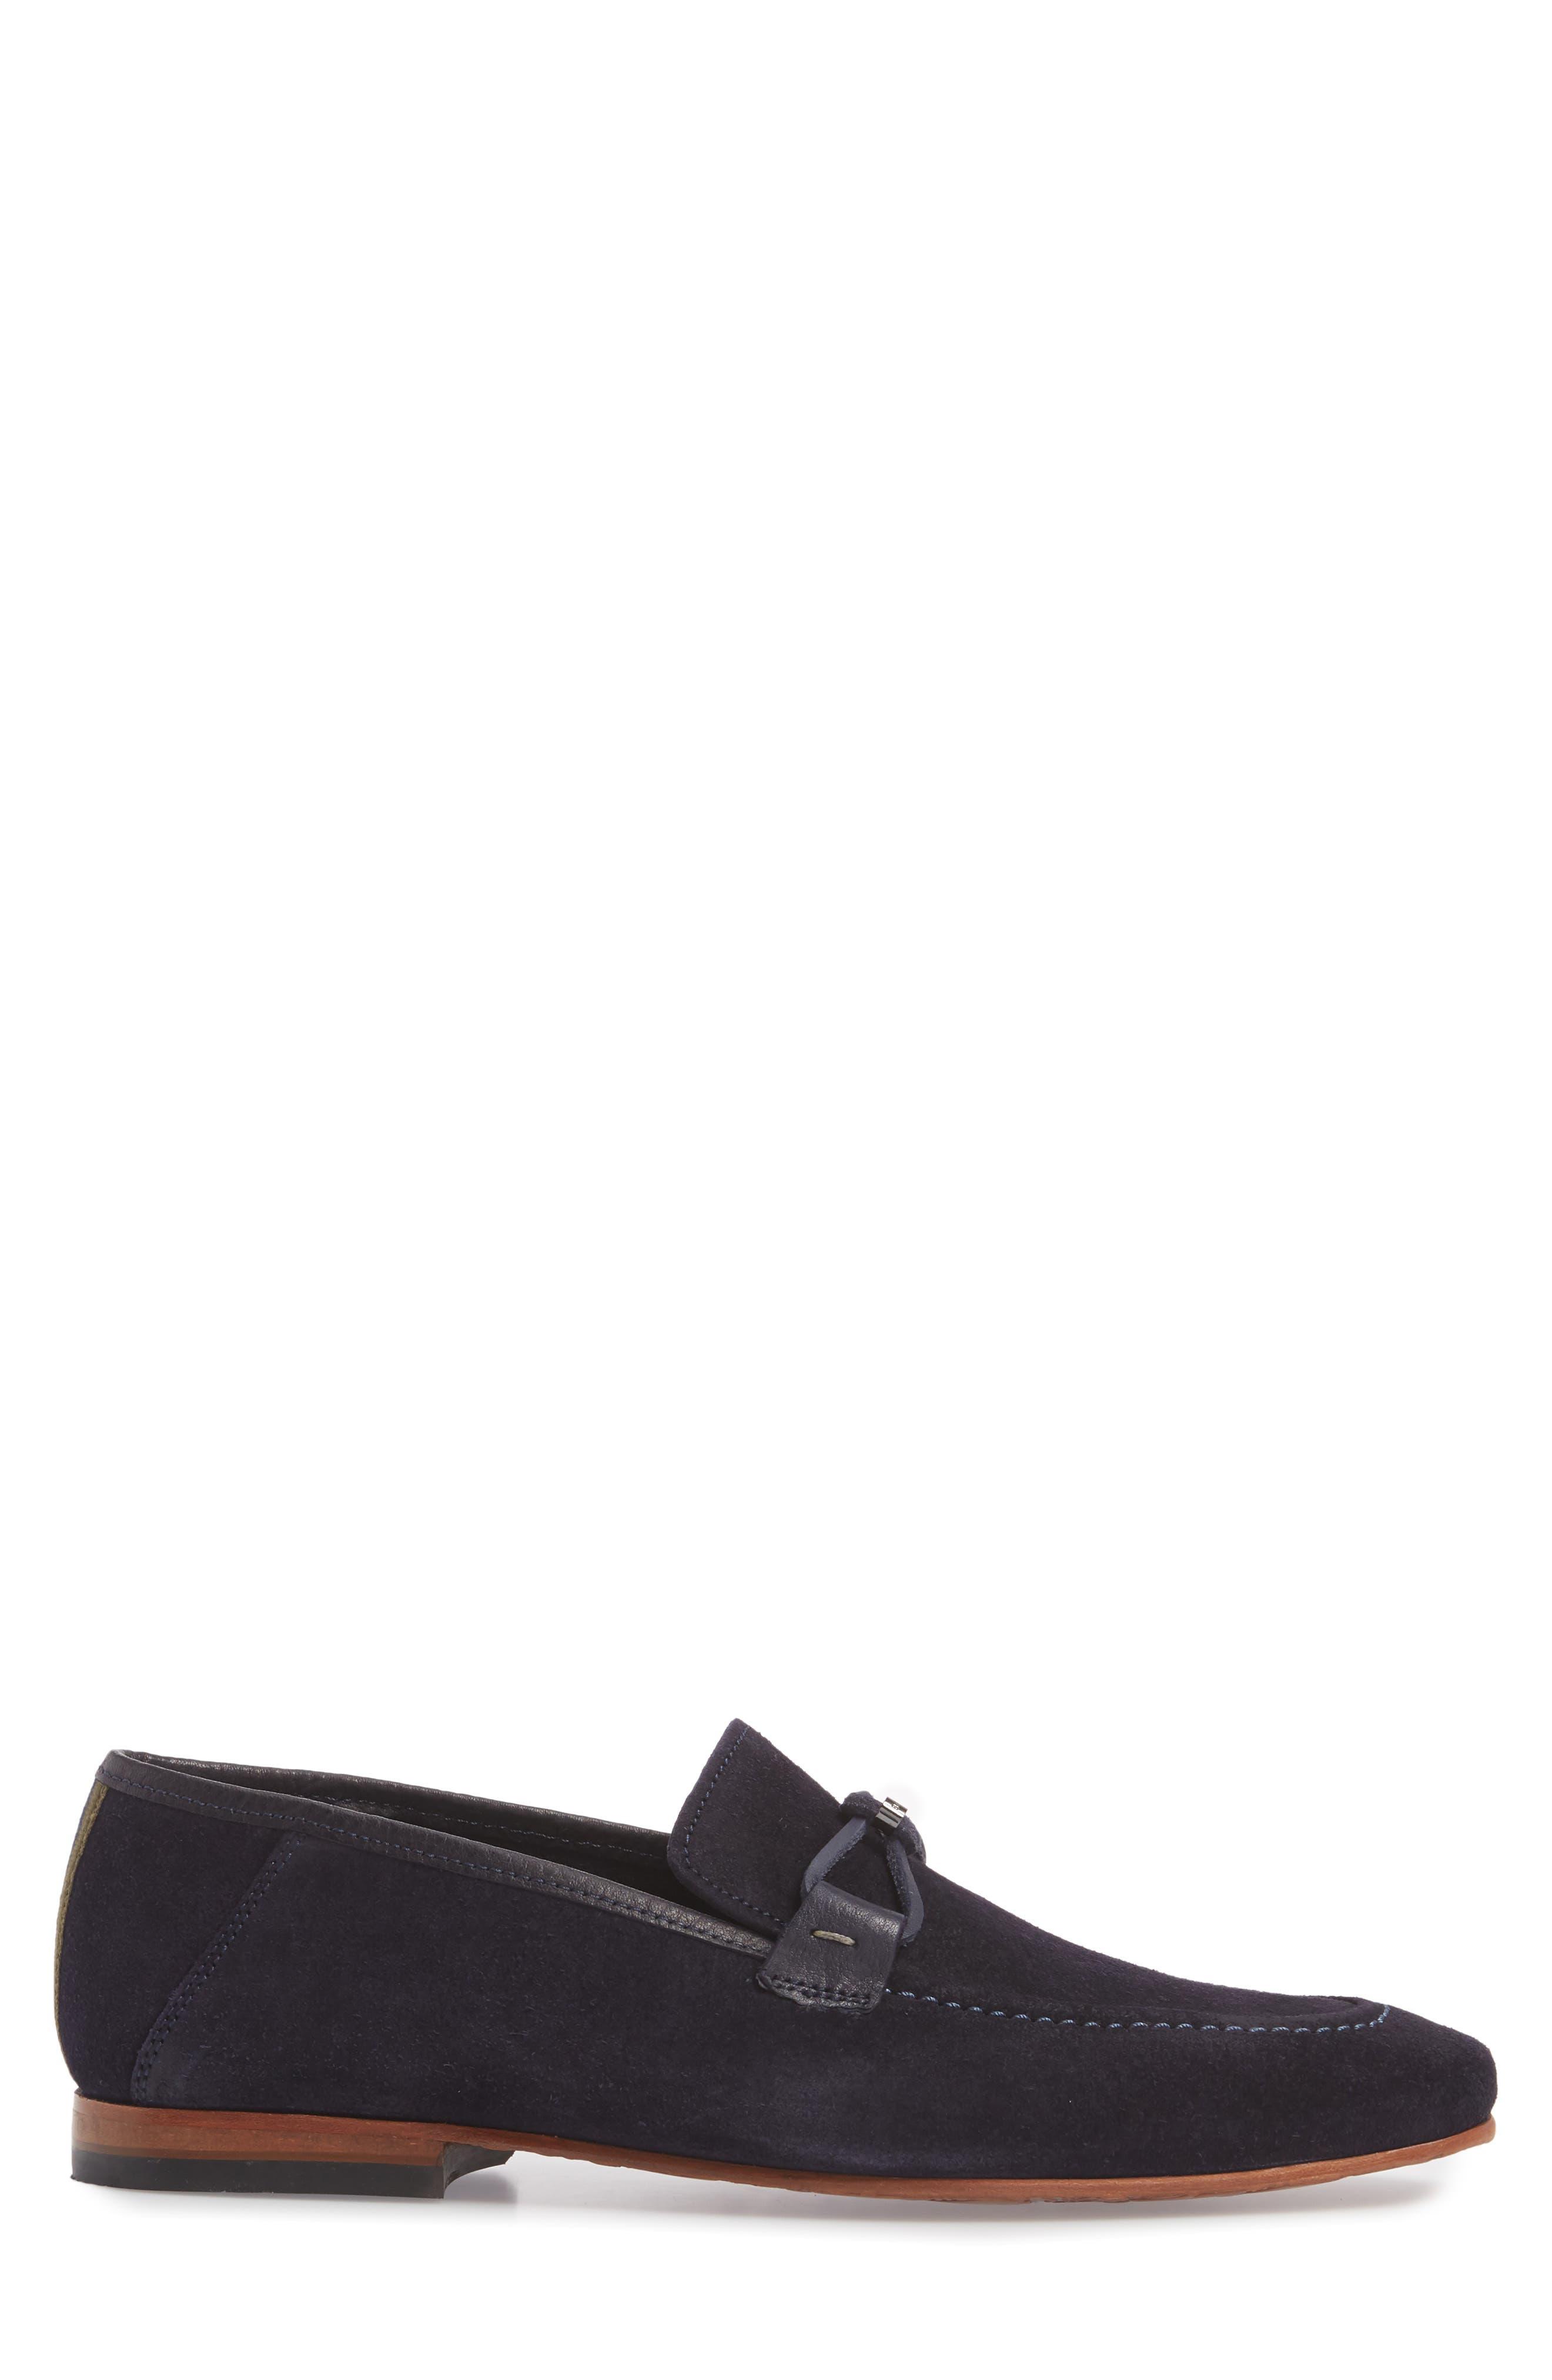 Hoppken Convertible Knotted Loafer,                             Alternate thumbnail 3, color,                             Dark Blue Suede